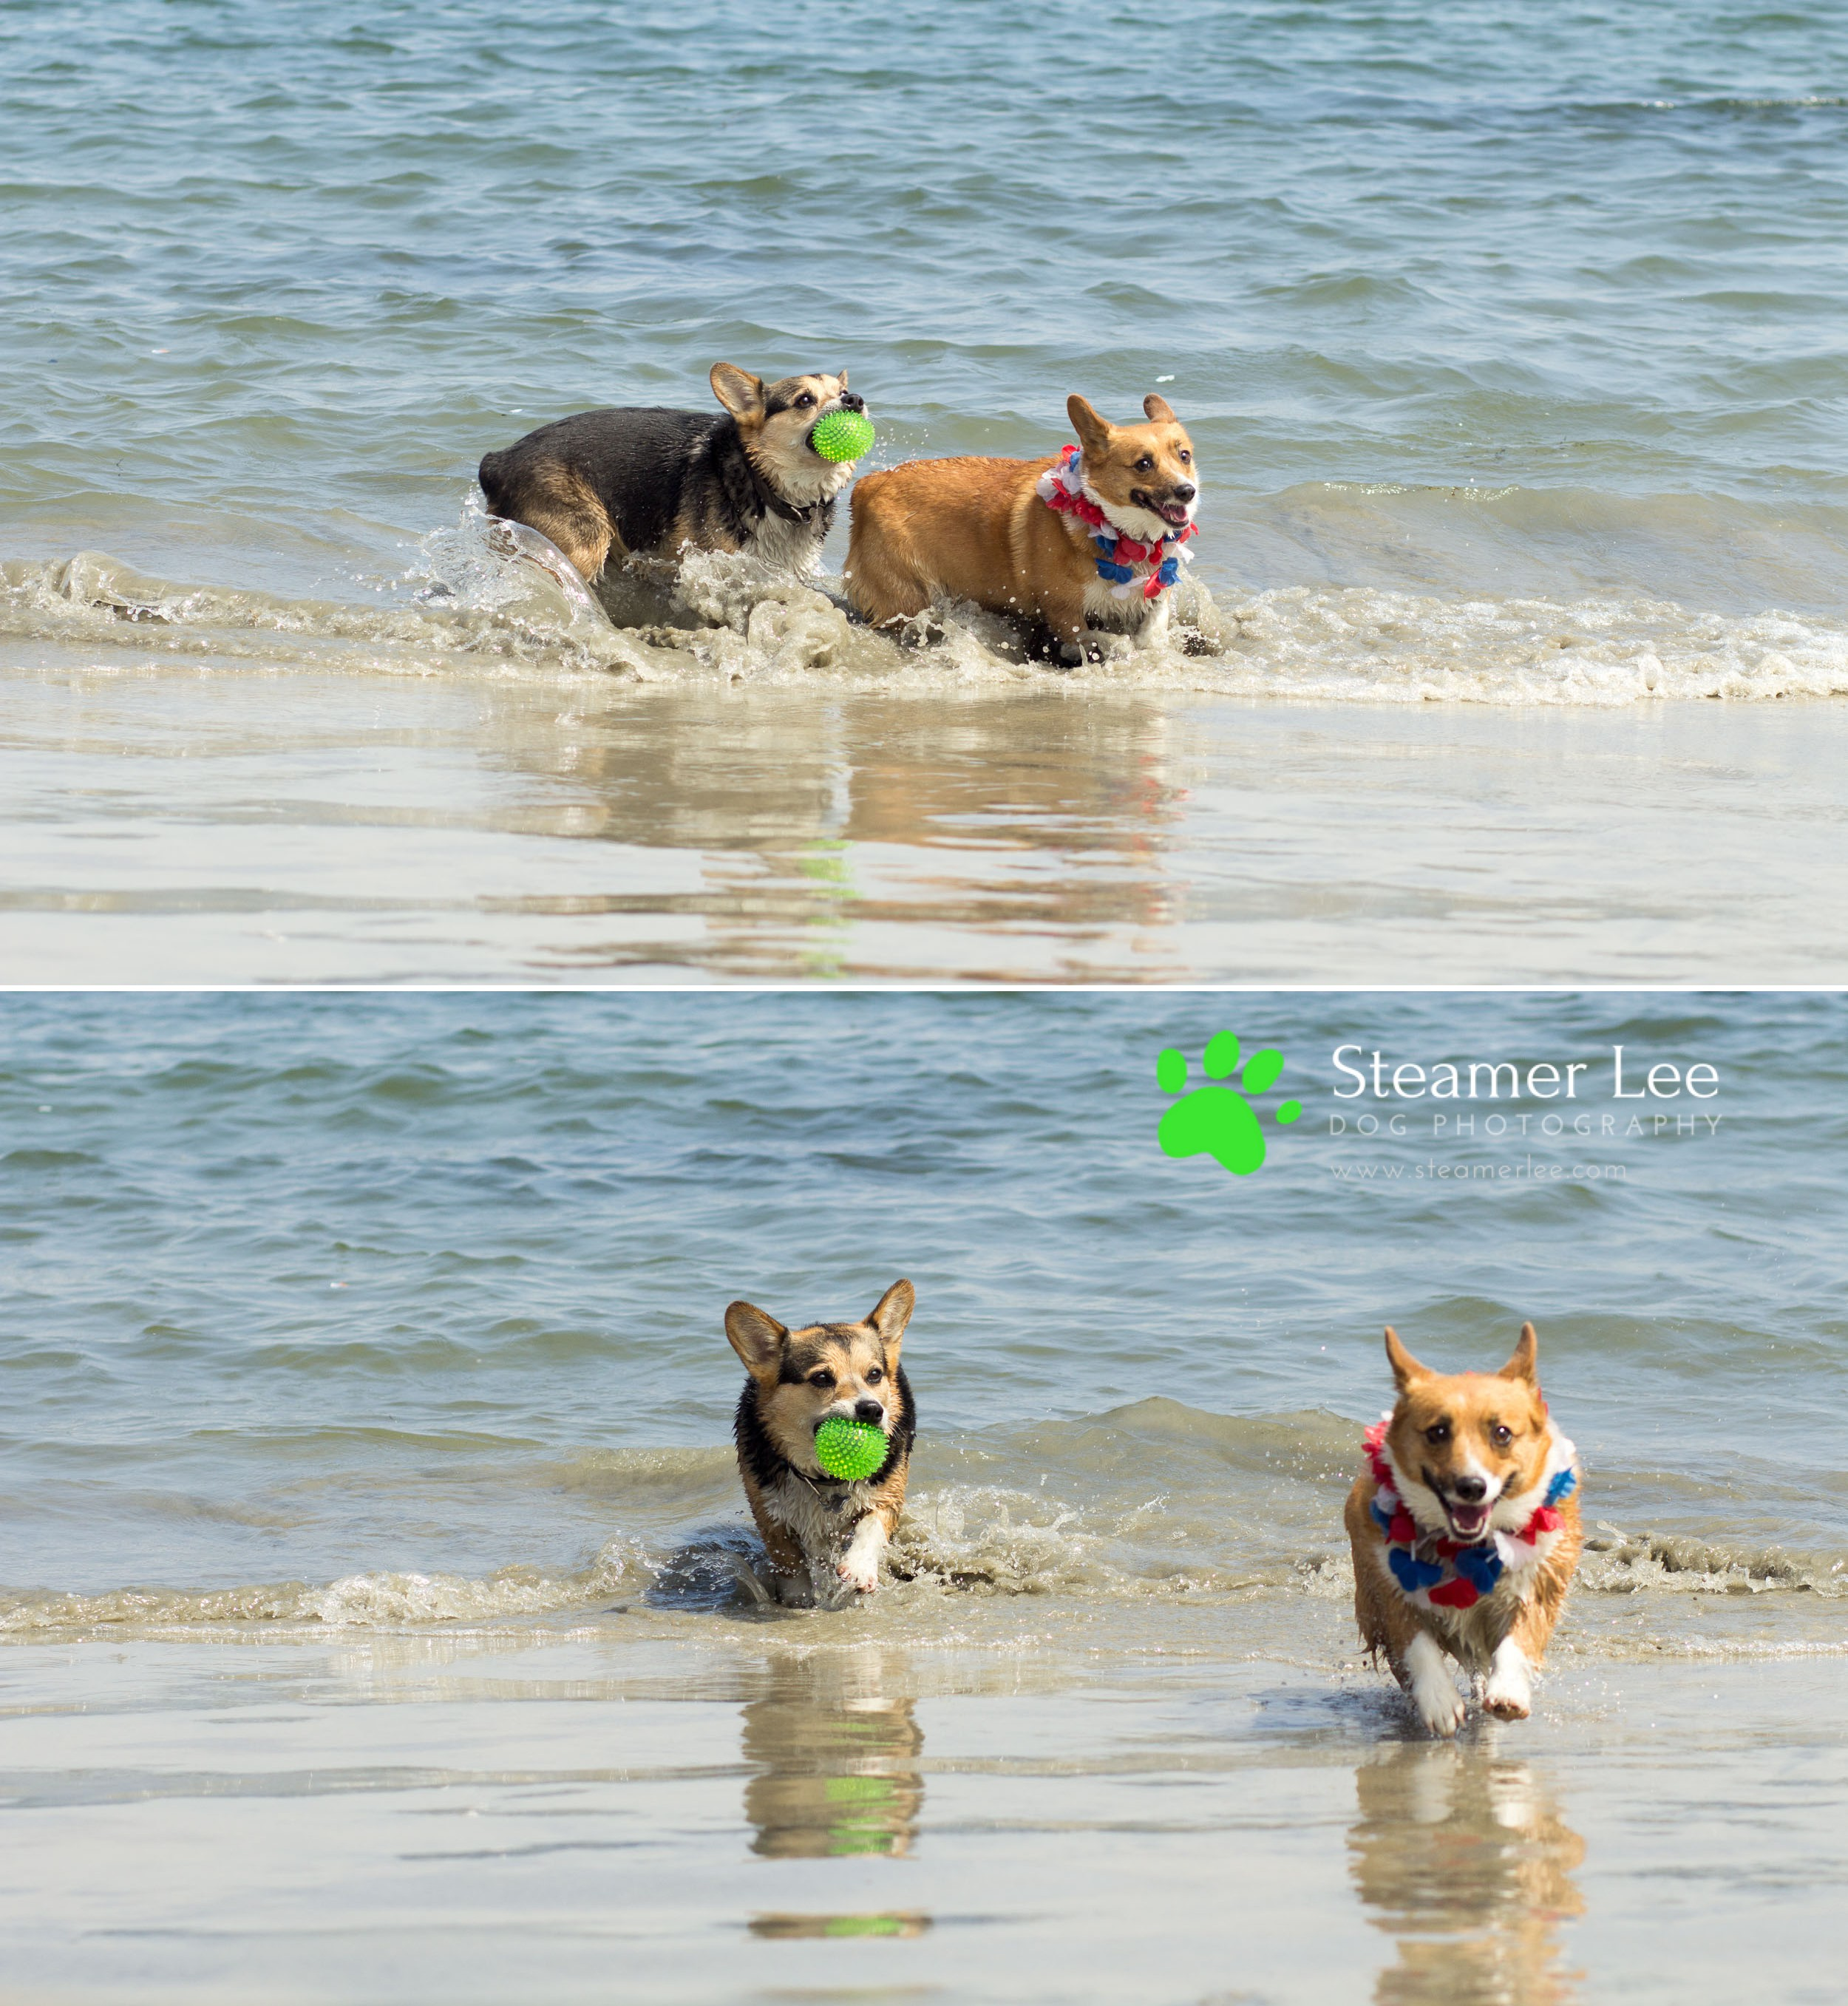 Steamer Lee Dog Photography - July 2017 So Cal Corgi Beach Day - Vol. 3 - 15.jpg